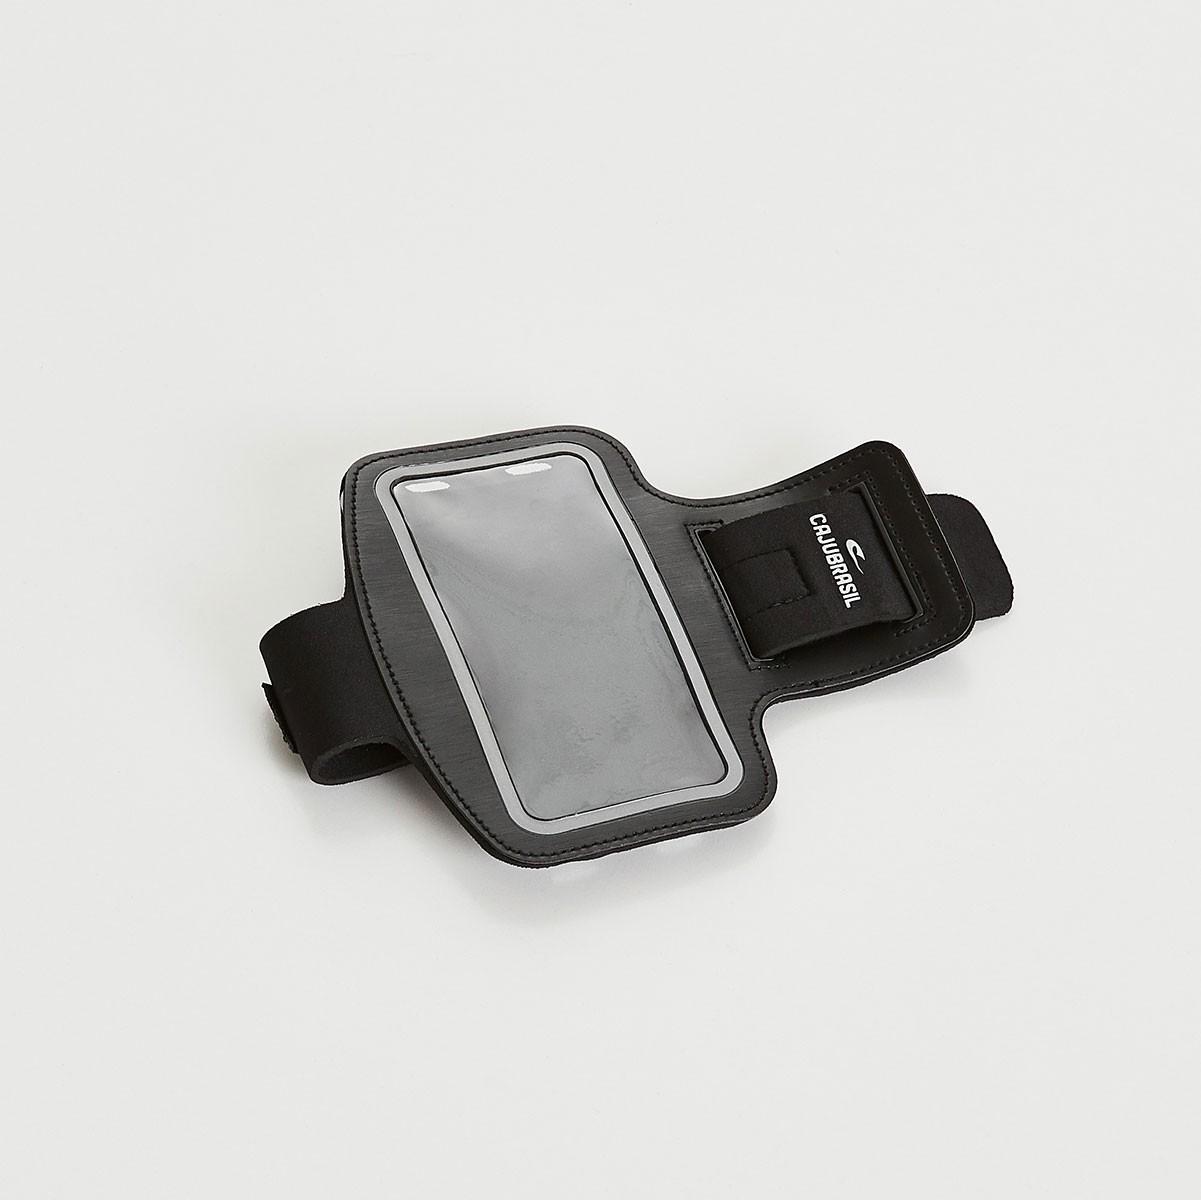 CAJUBRASIL Moda Fitness   Porta Celular Preto 142a95bbfe